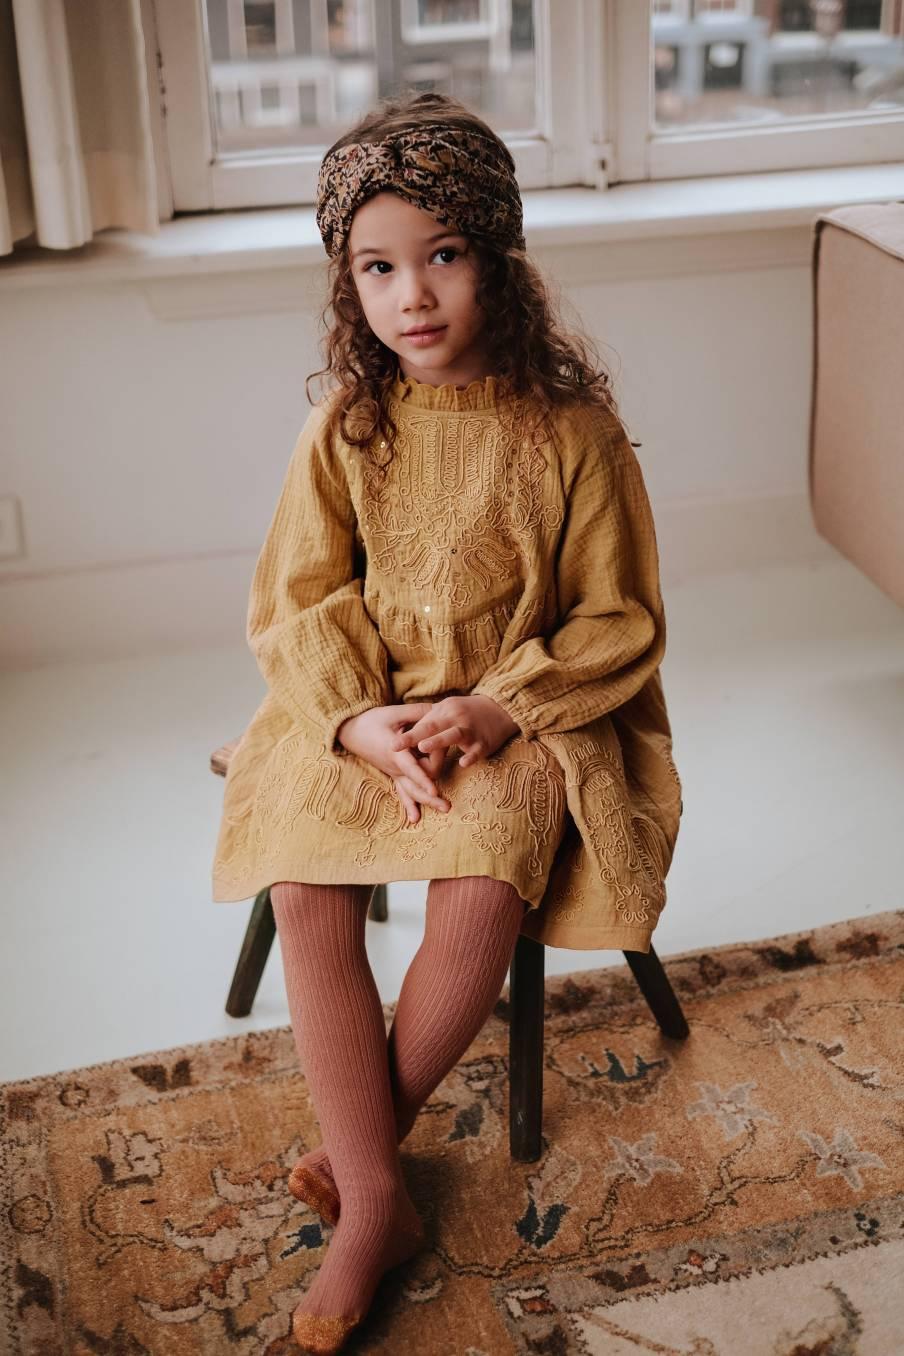 boheme chic vintage robe bébé fille suenna spicy